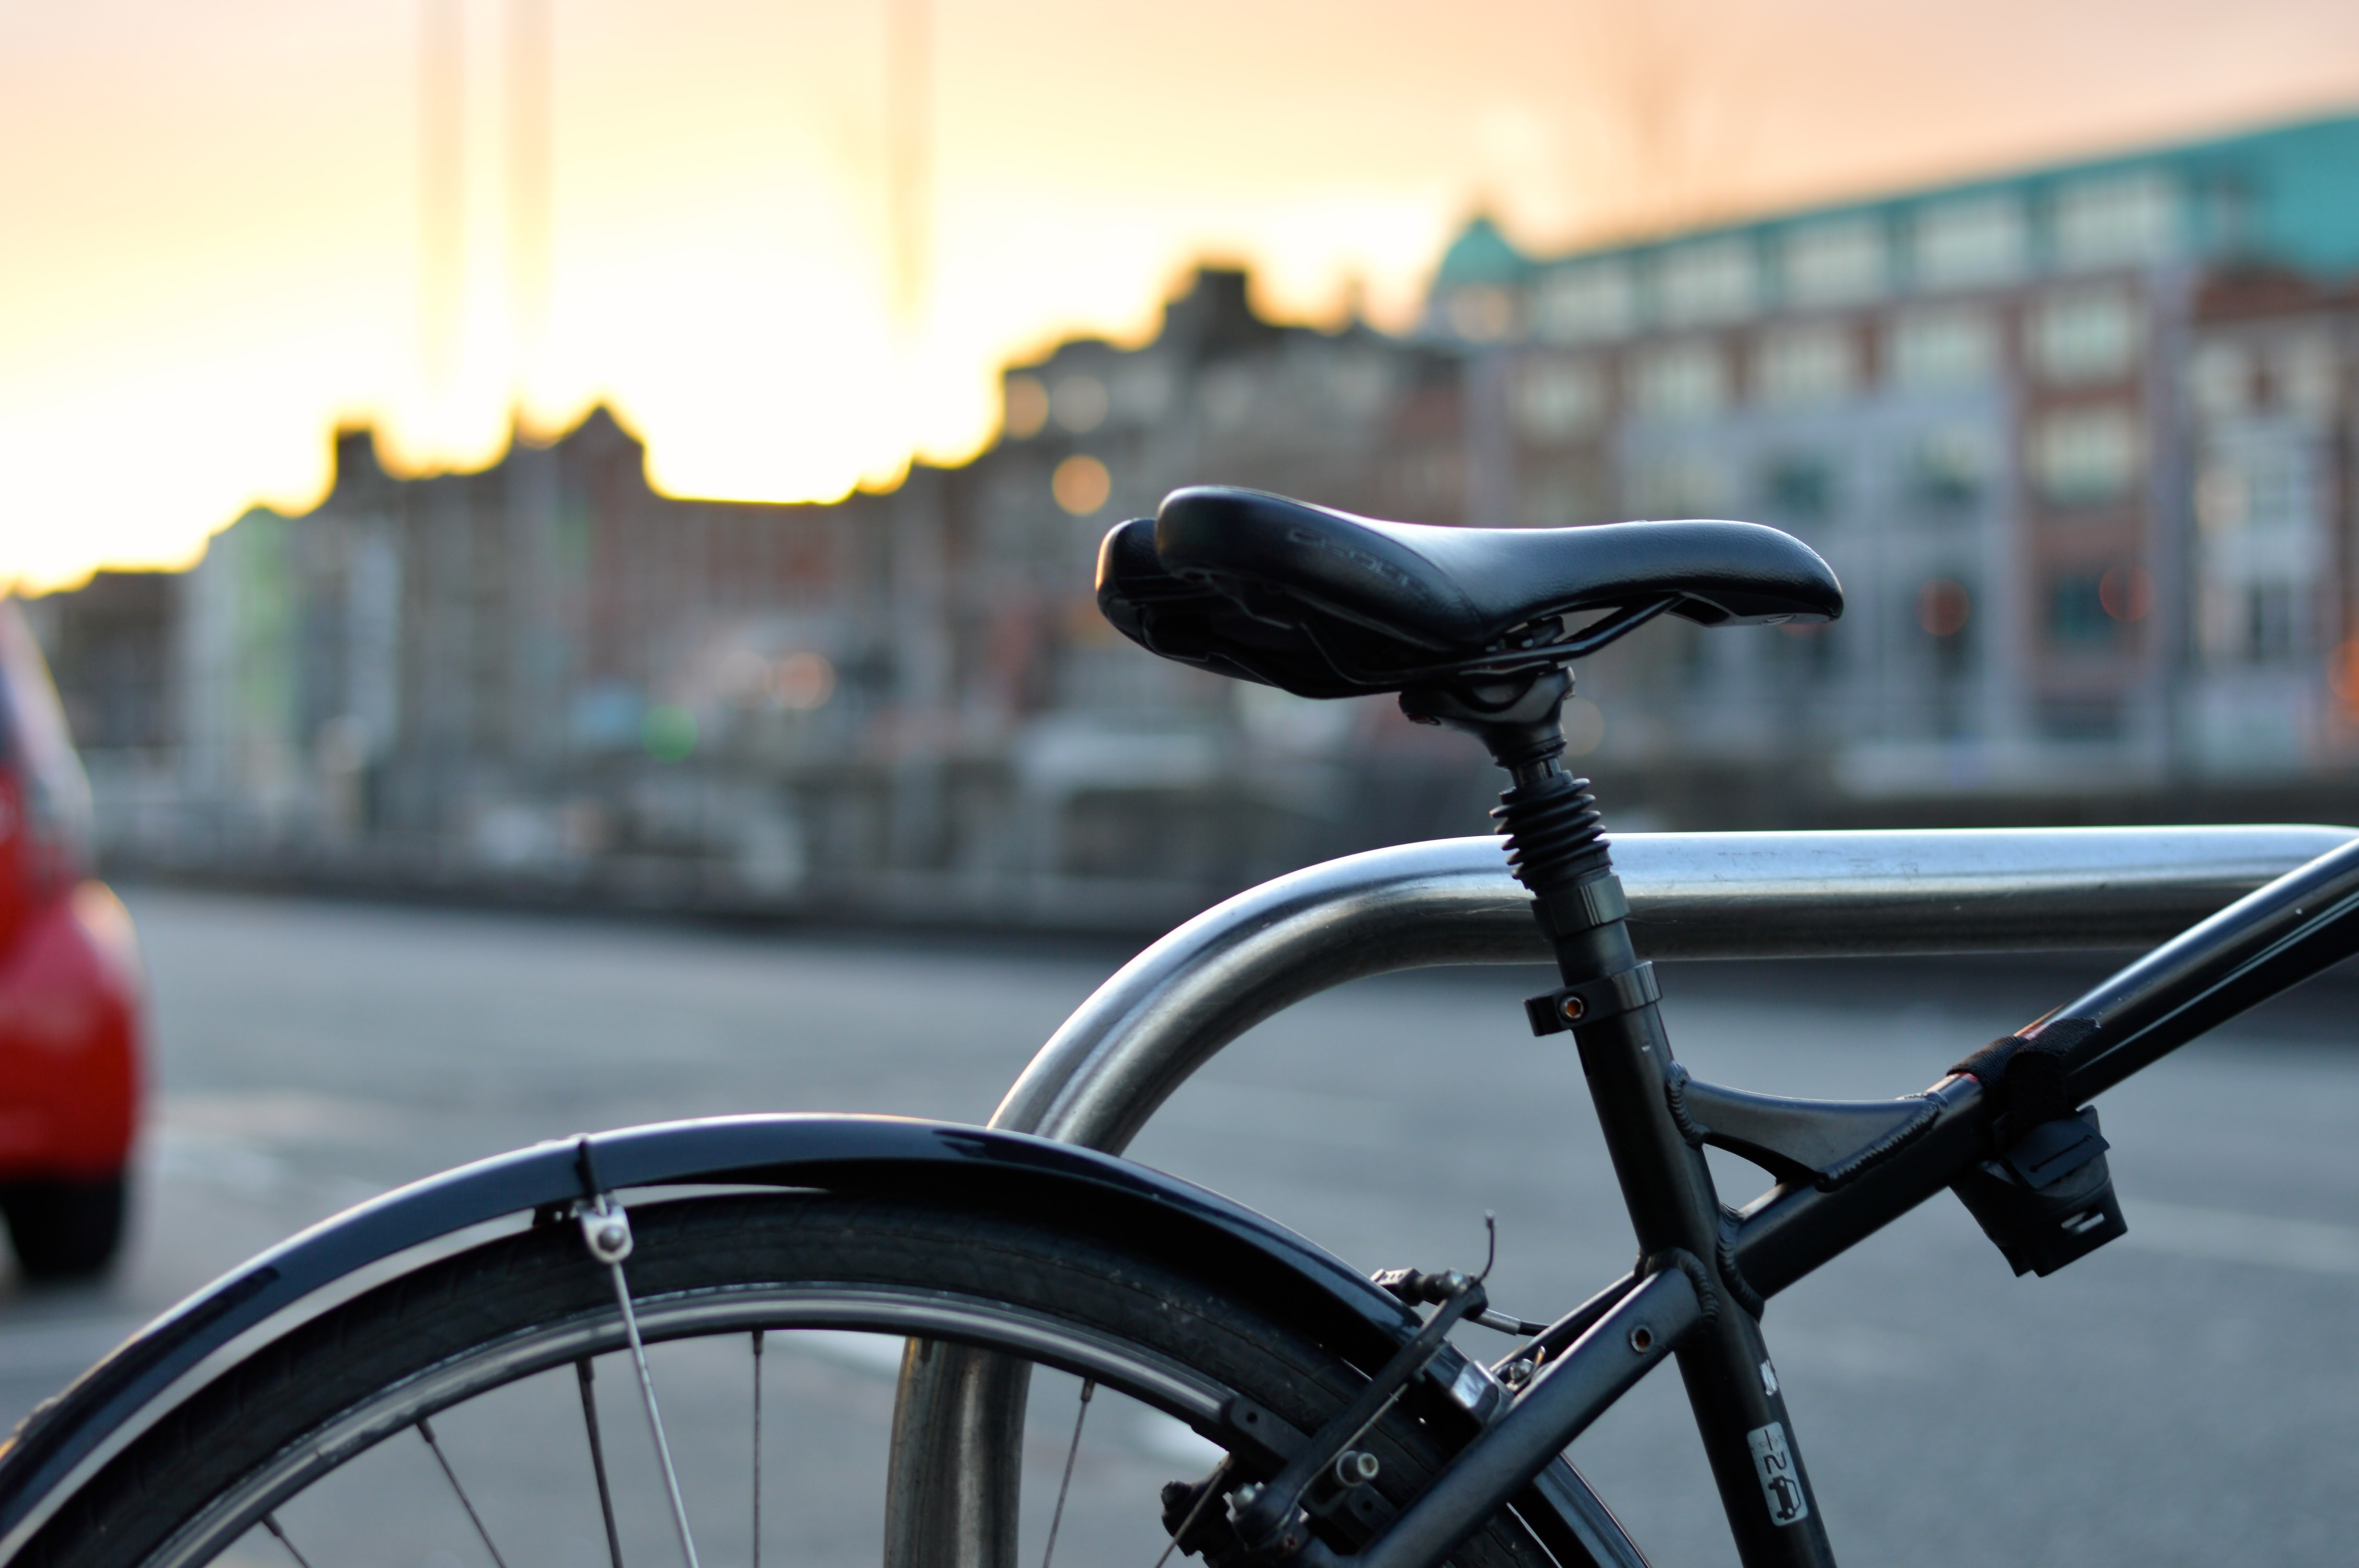 vélo pexels alejandro lopez